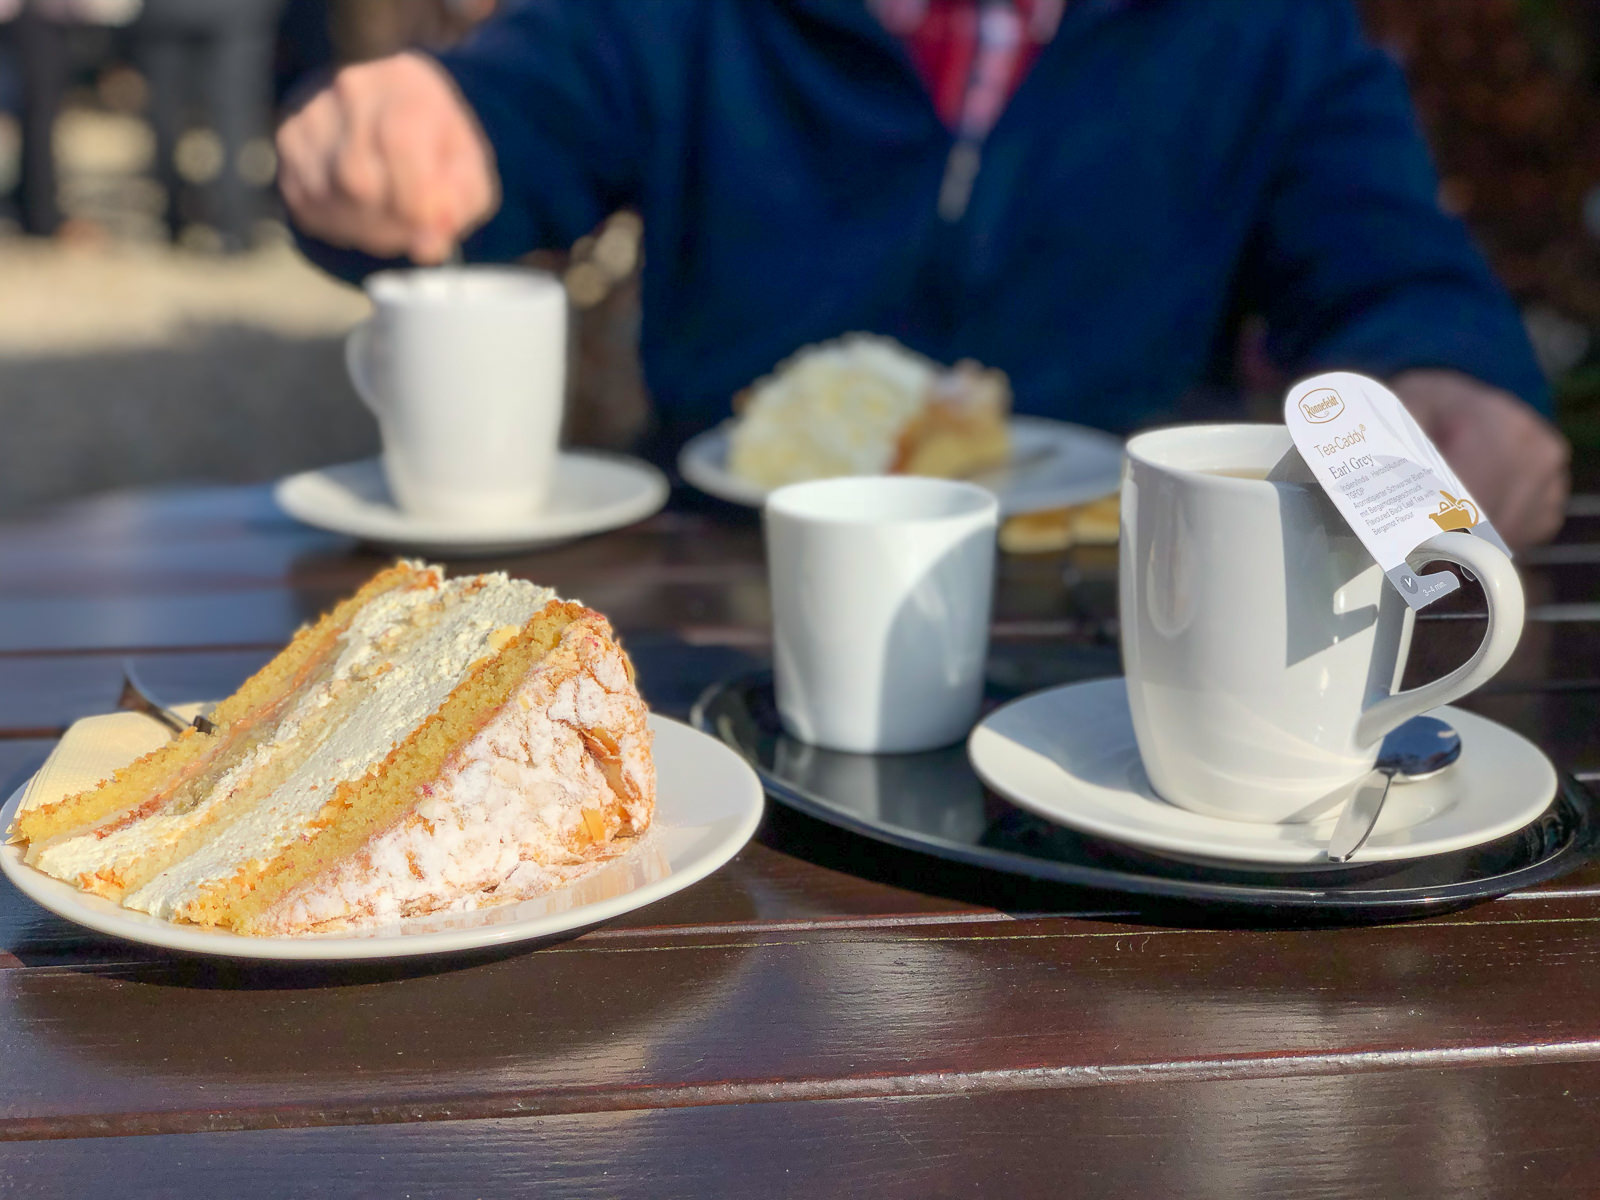 Landcafé Hochwald, Wintschgers Erb, Landcafé, Bauernhofcafé, Hofcafé, Niederrhein